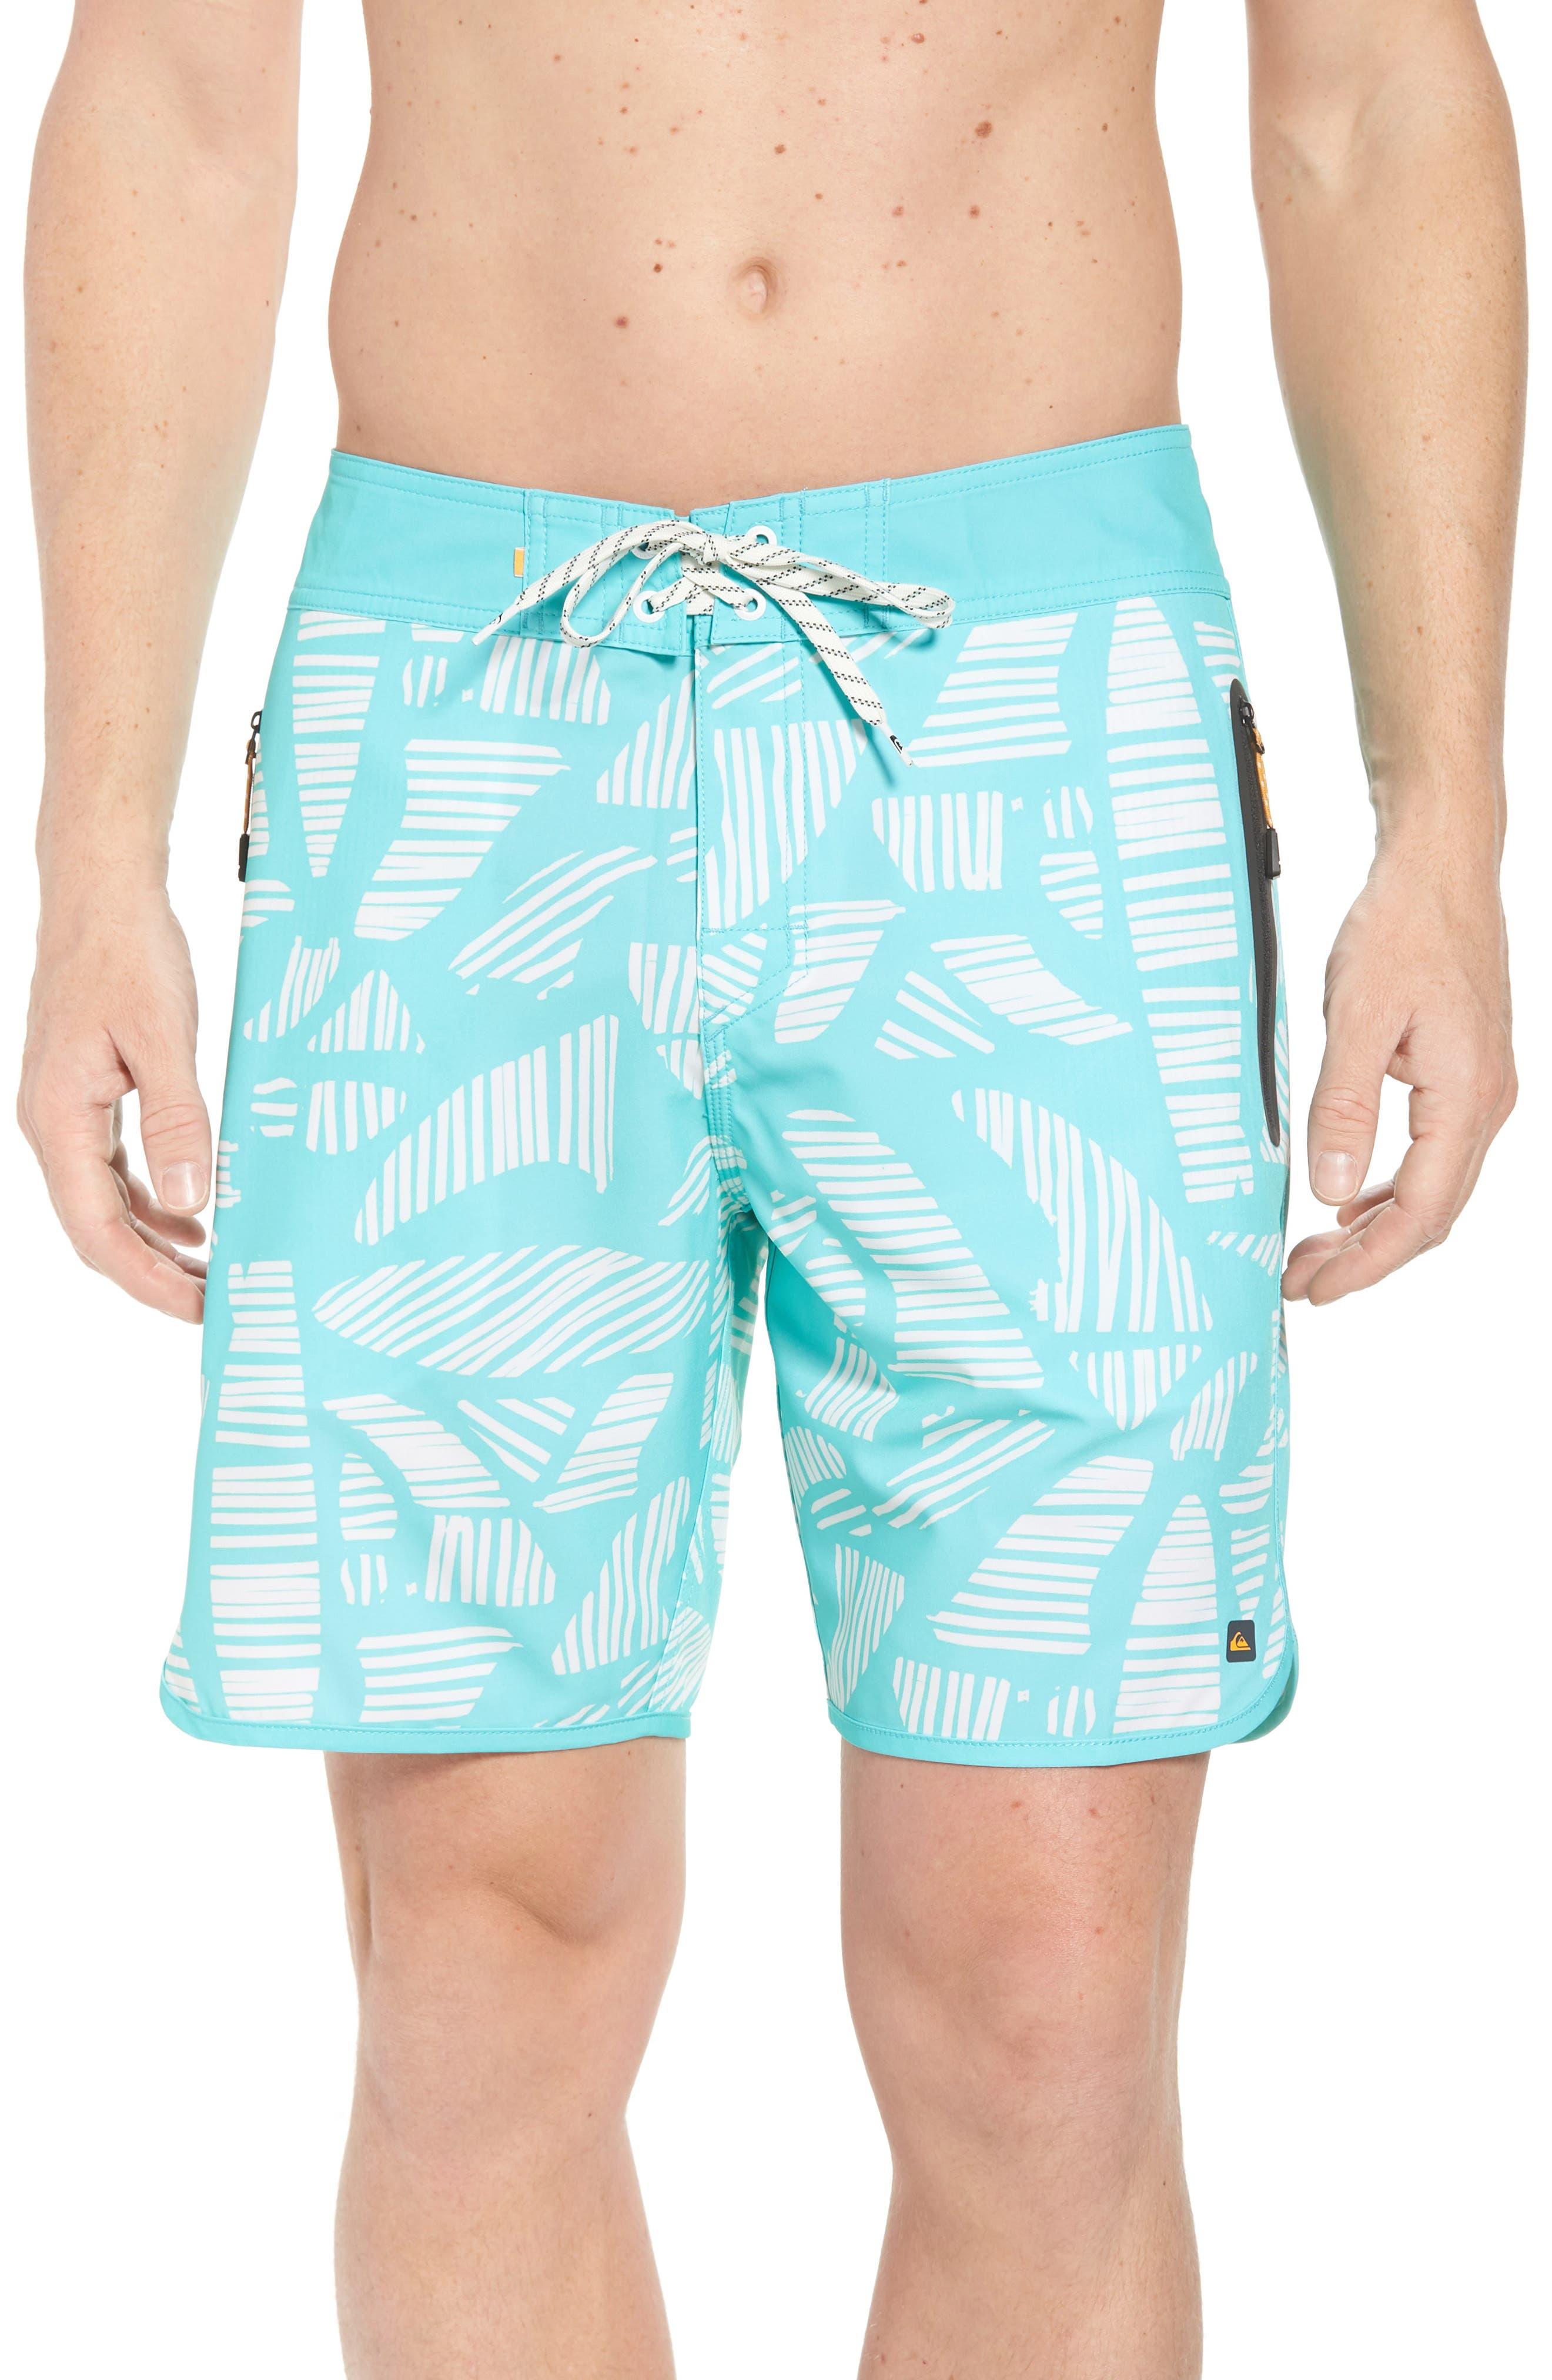 Odysea Board Shorts,                             Main thumbnail 1, color,                             BLUE RADIANCE